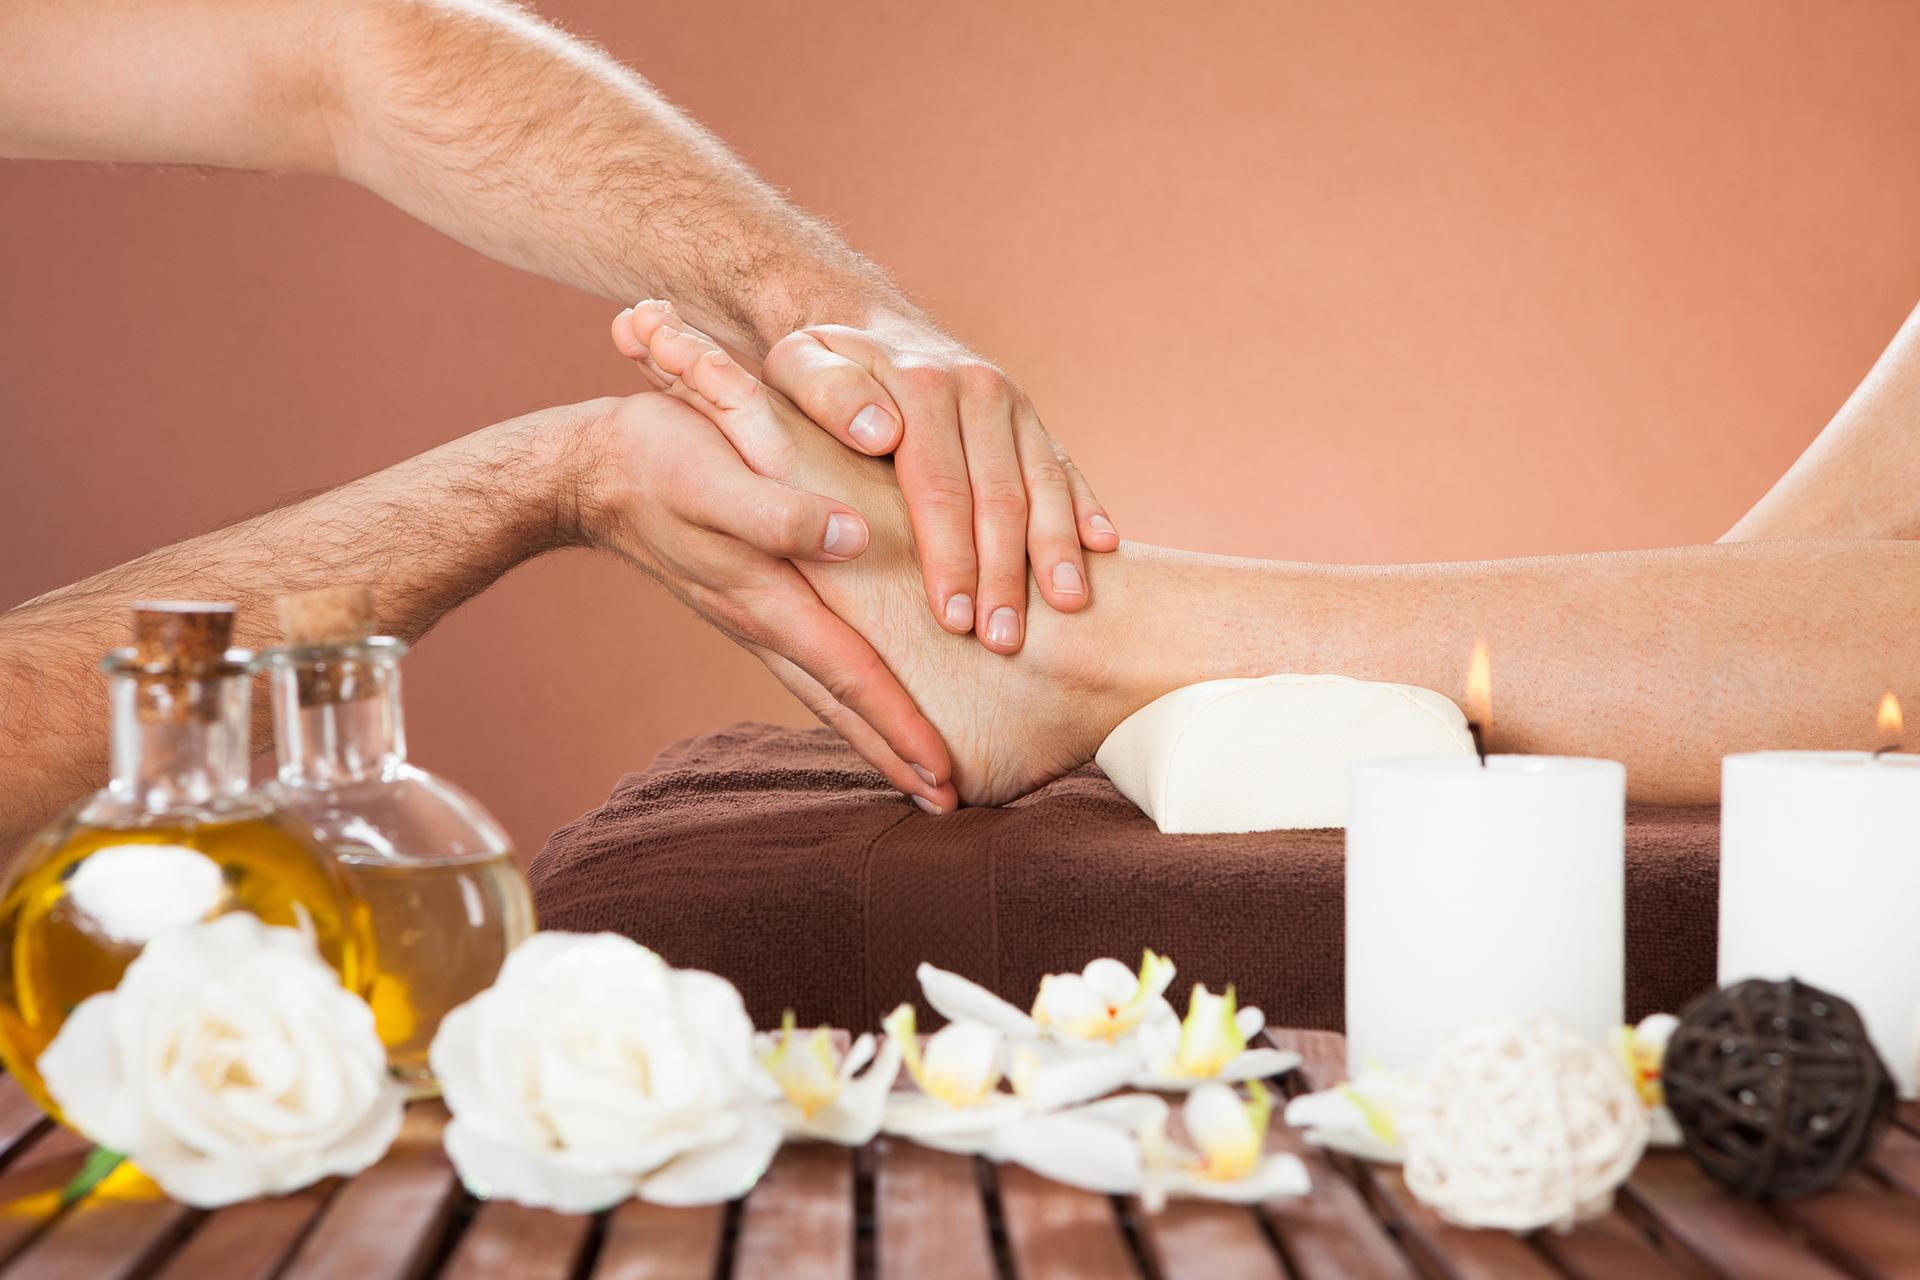 Reflexology in Ocala, Florida - Be Well Holistic Massage and Wel